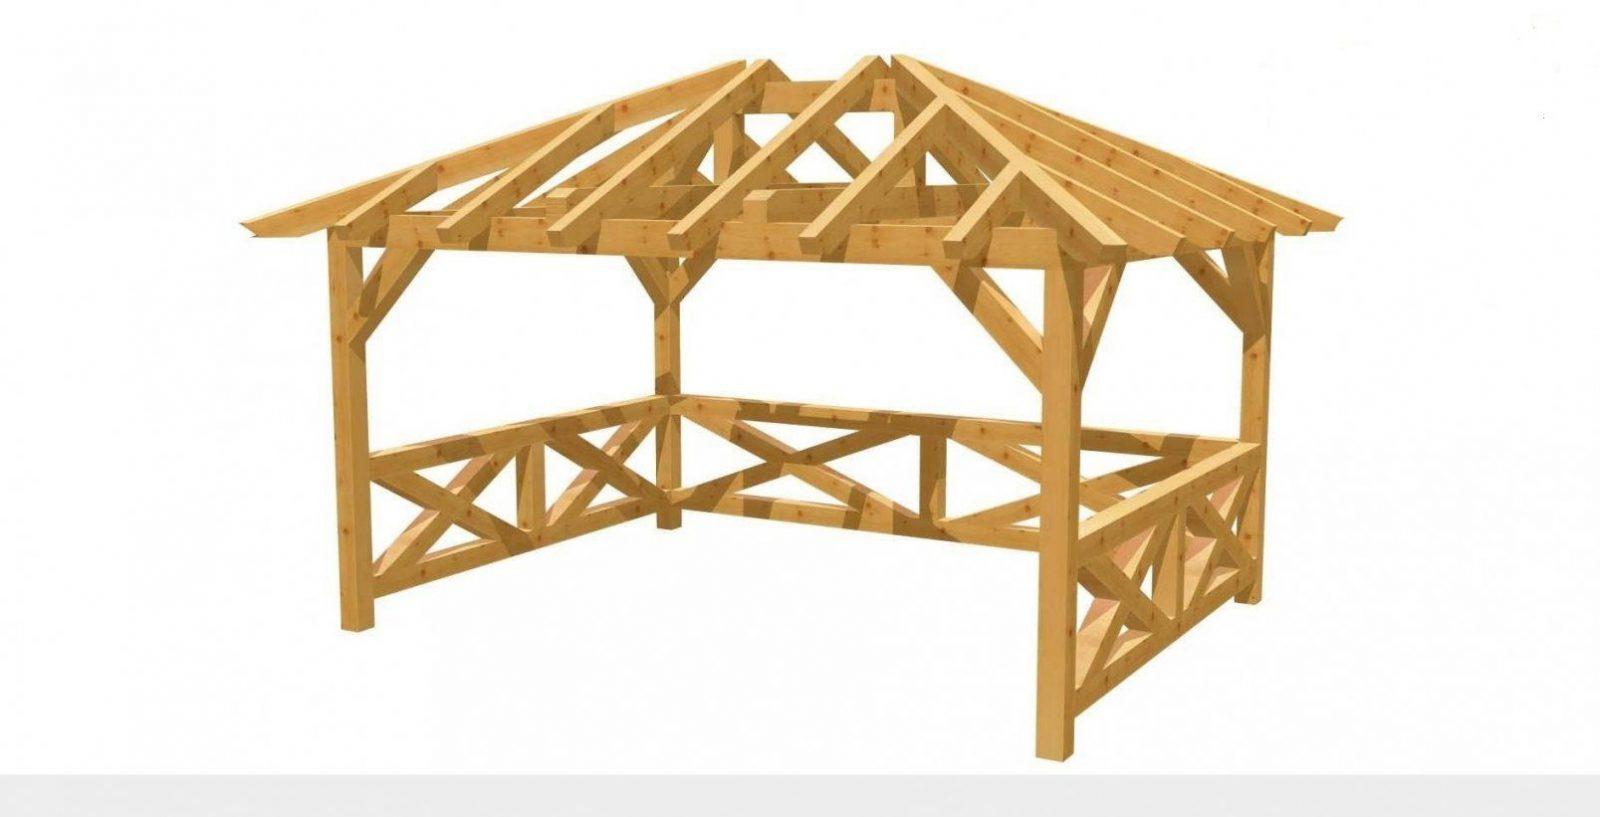 Pavillon Atemberaubend Pavillon Selber Bauen Ideen Fesselnd von Holz Pavillon 3X3 Selber Bauen Photo